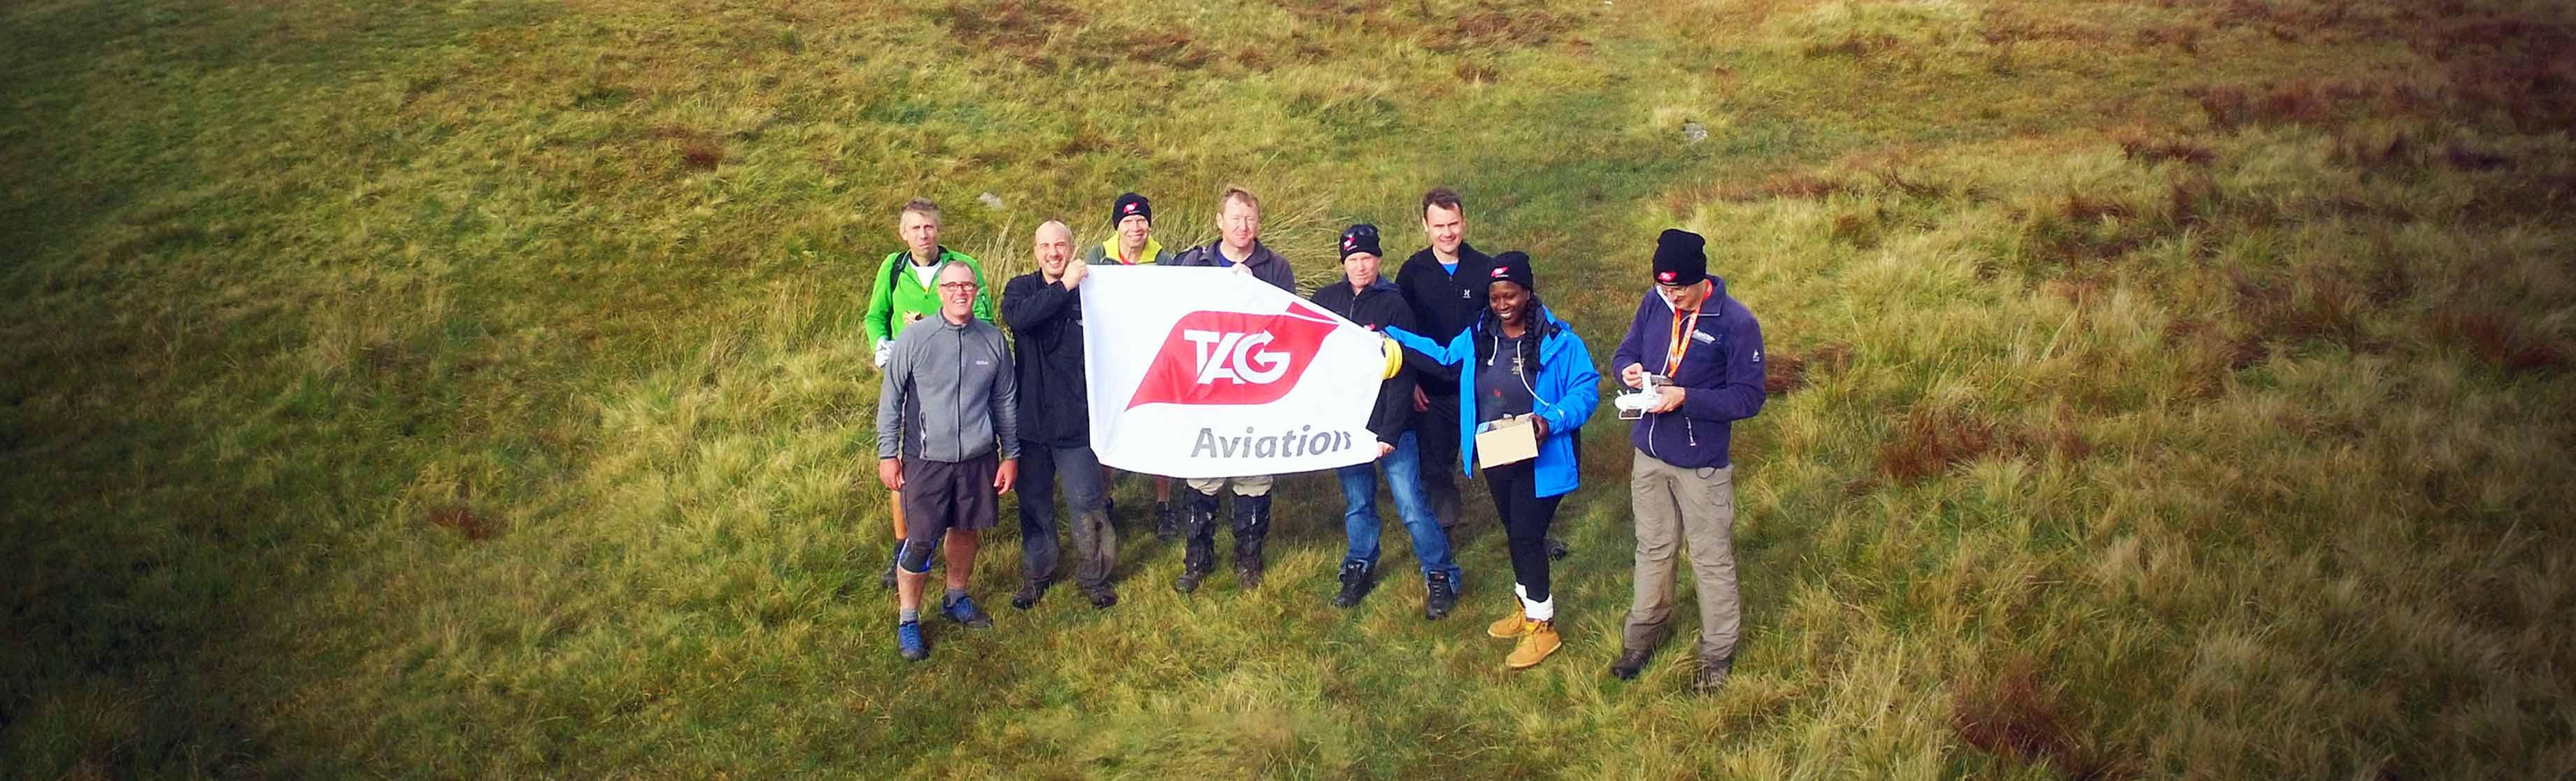 TAG航空英国团队为Fly2help筹得6000英镑